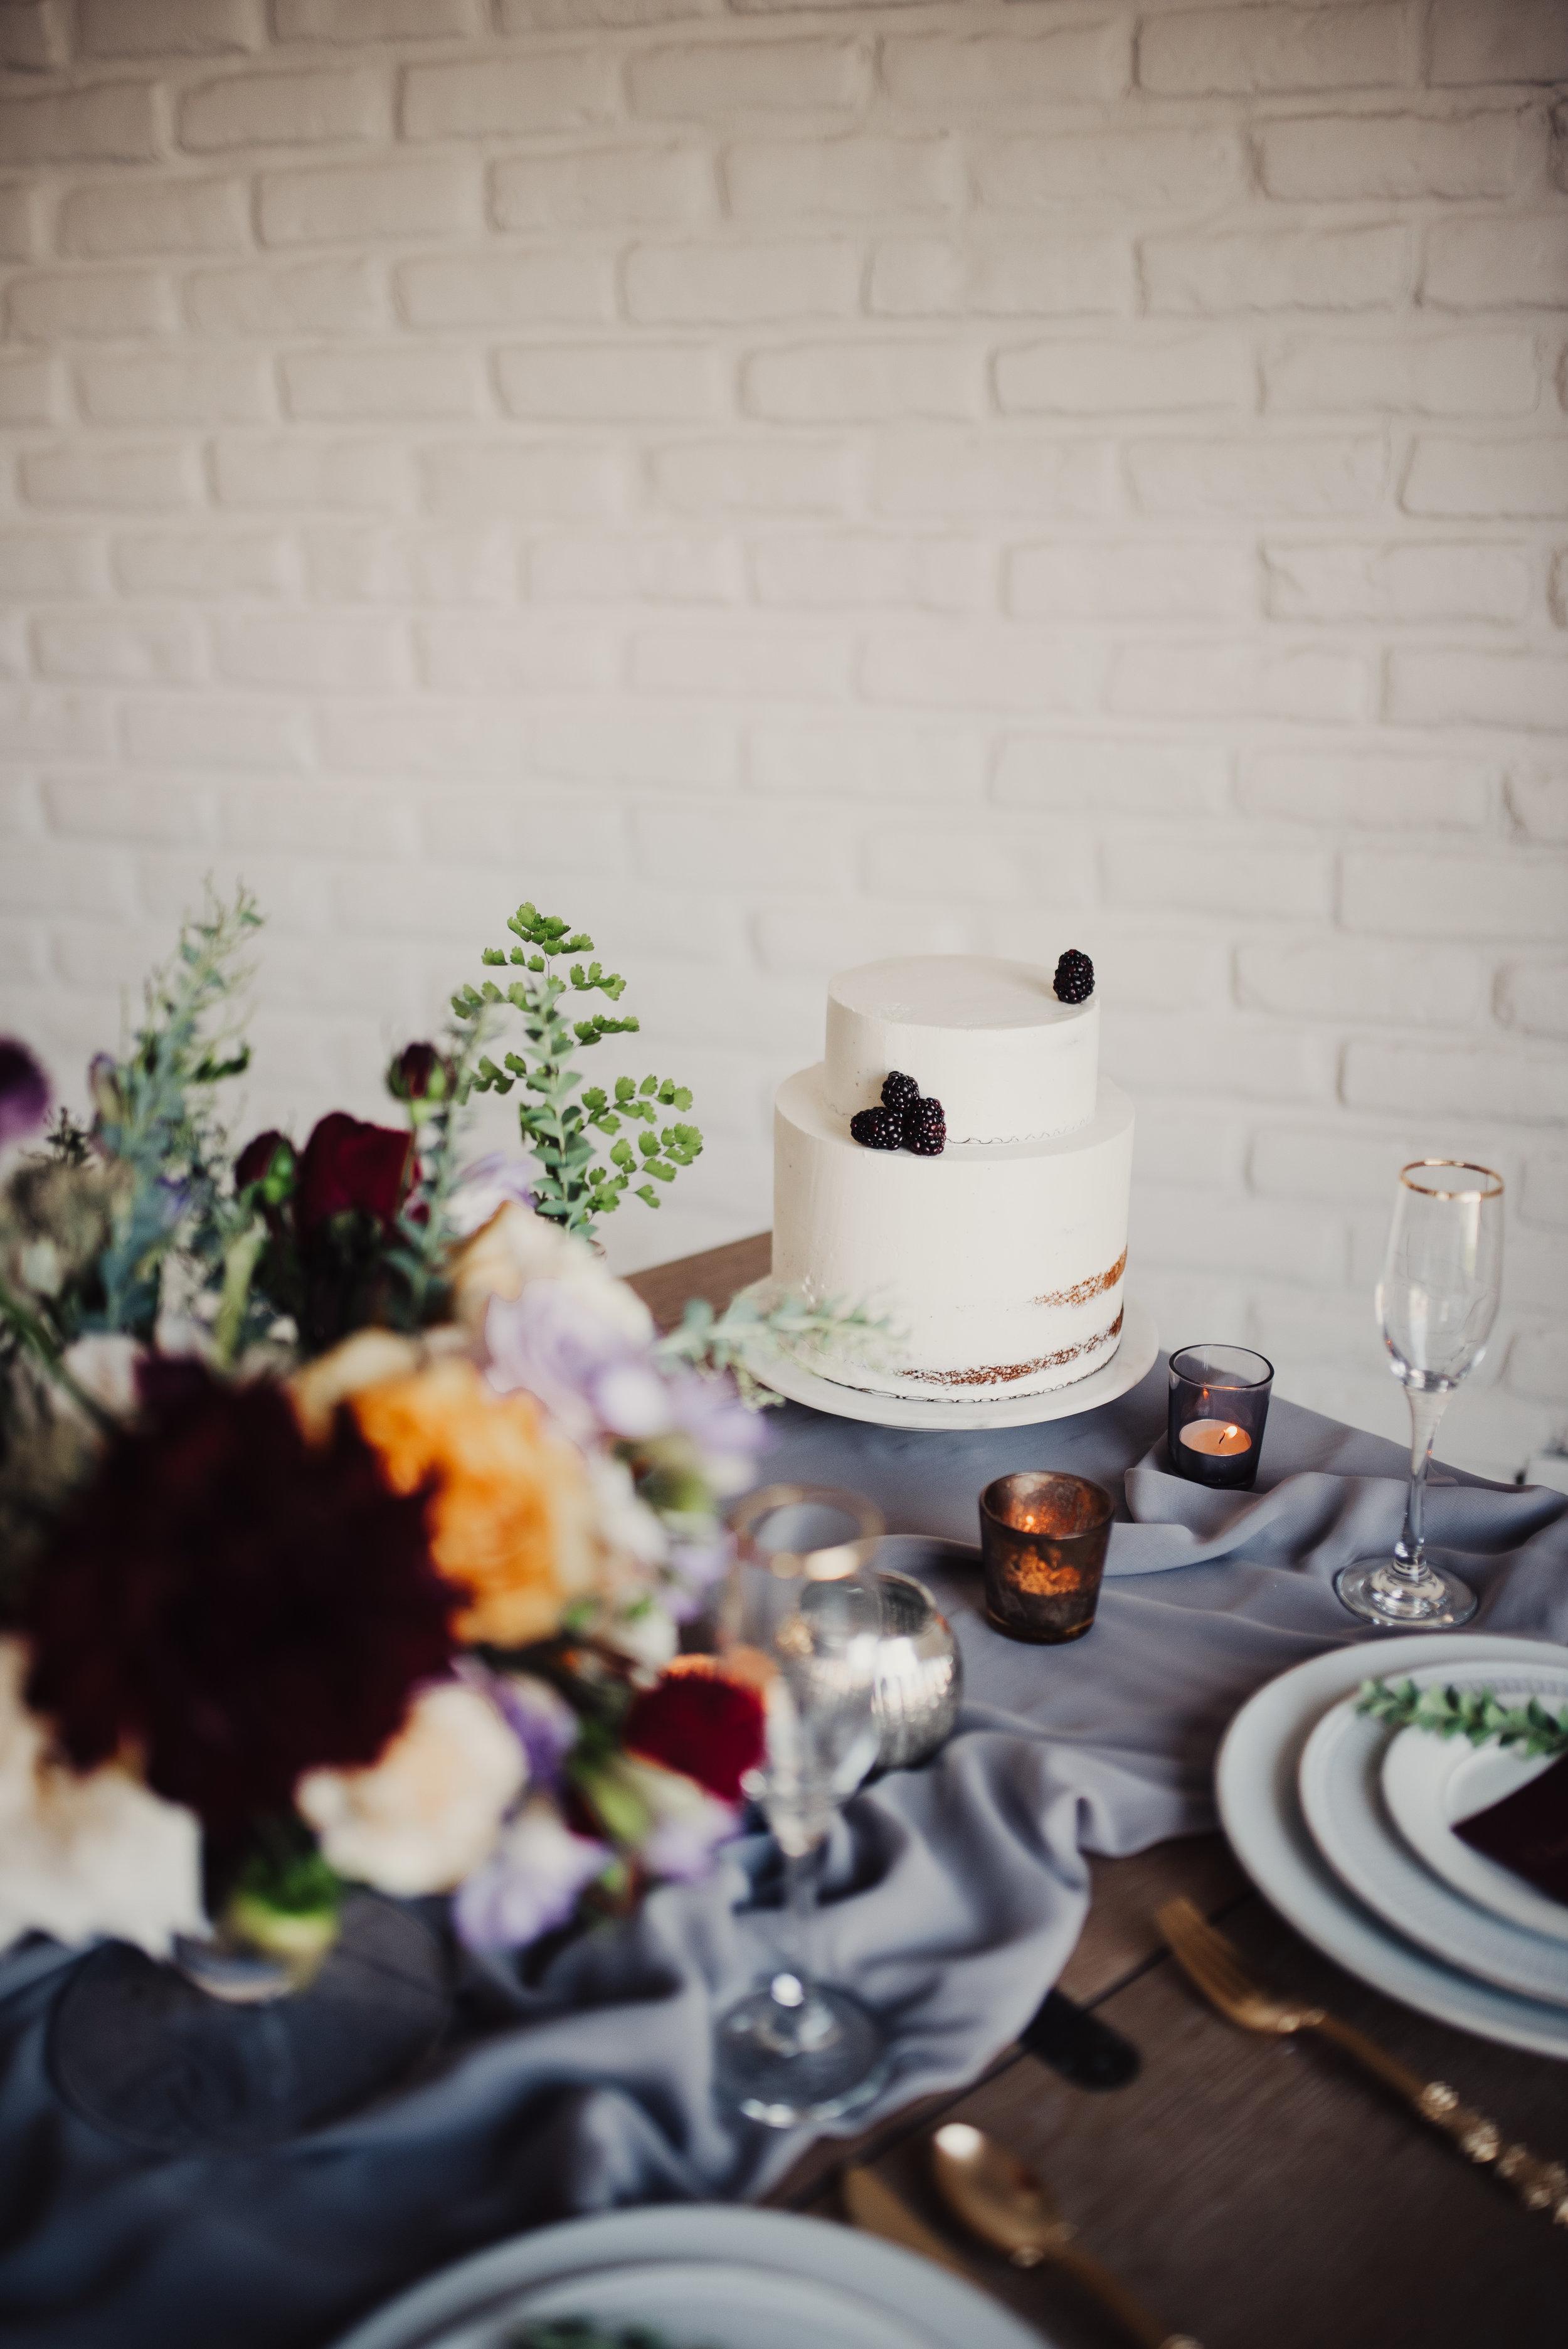 bright-cake-artistry-half-naked-wedding-cake.jpg